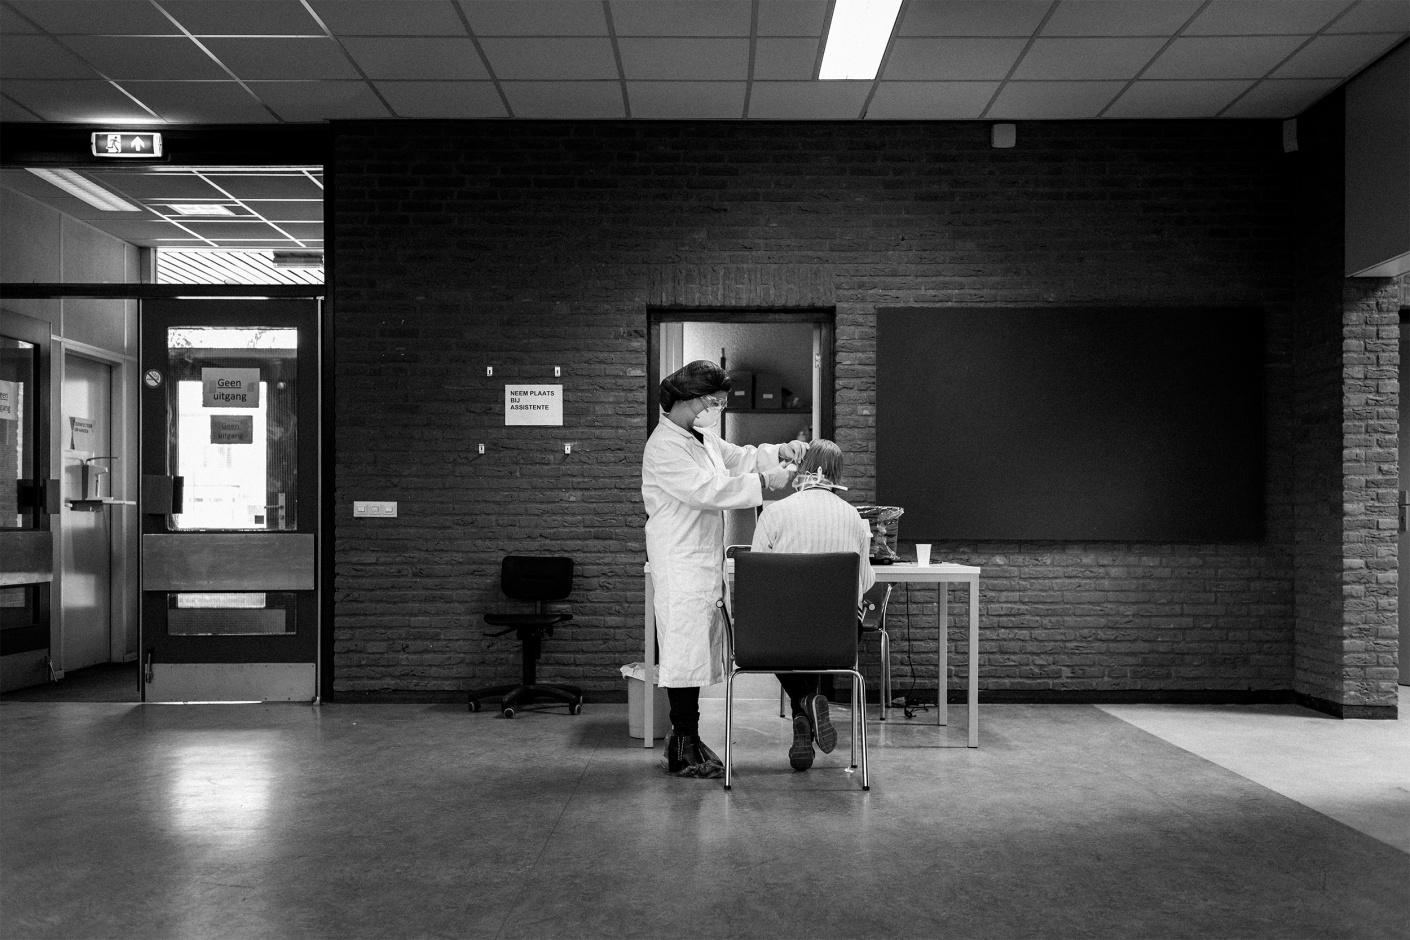 3 | CORONA | OPPENHEIM | Jelle Pieter de Boer